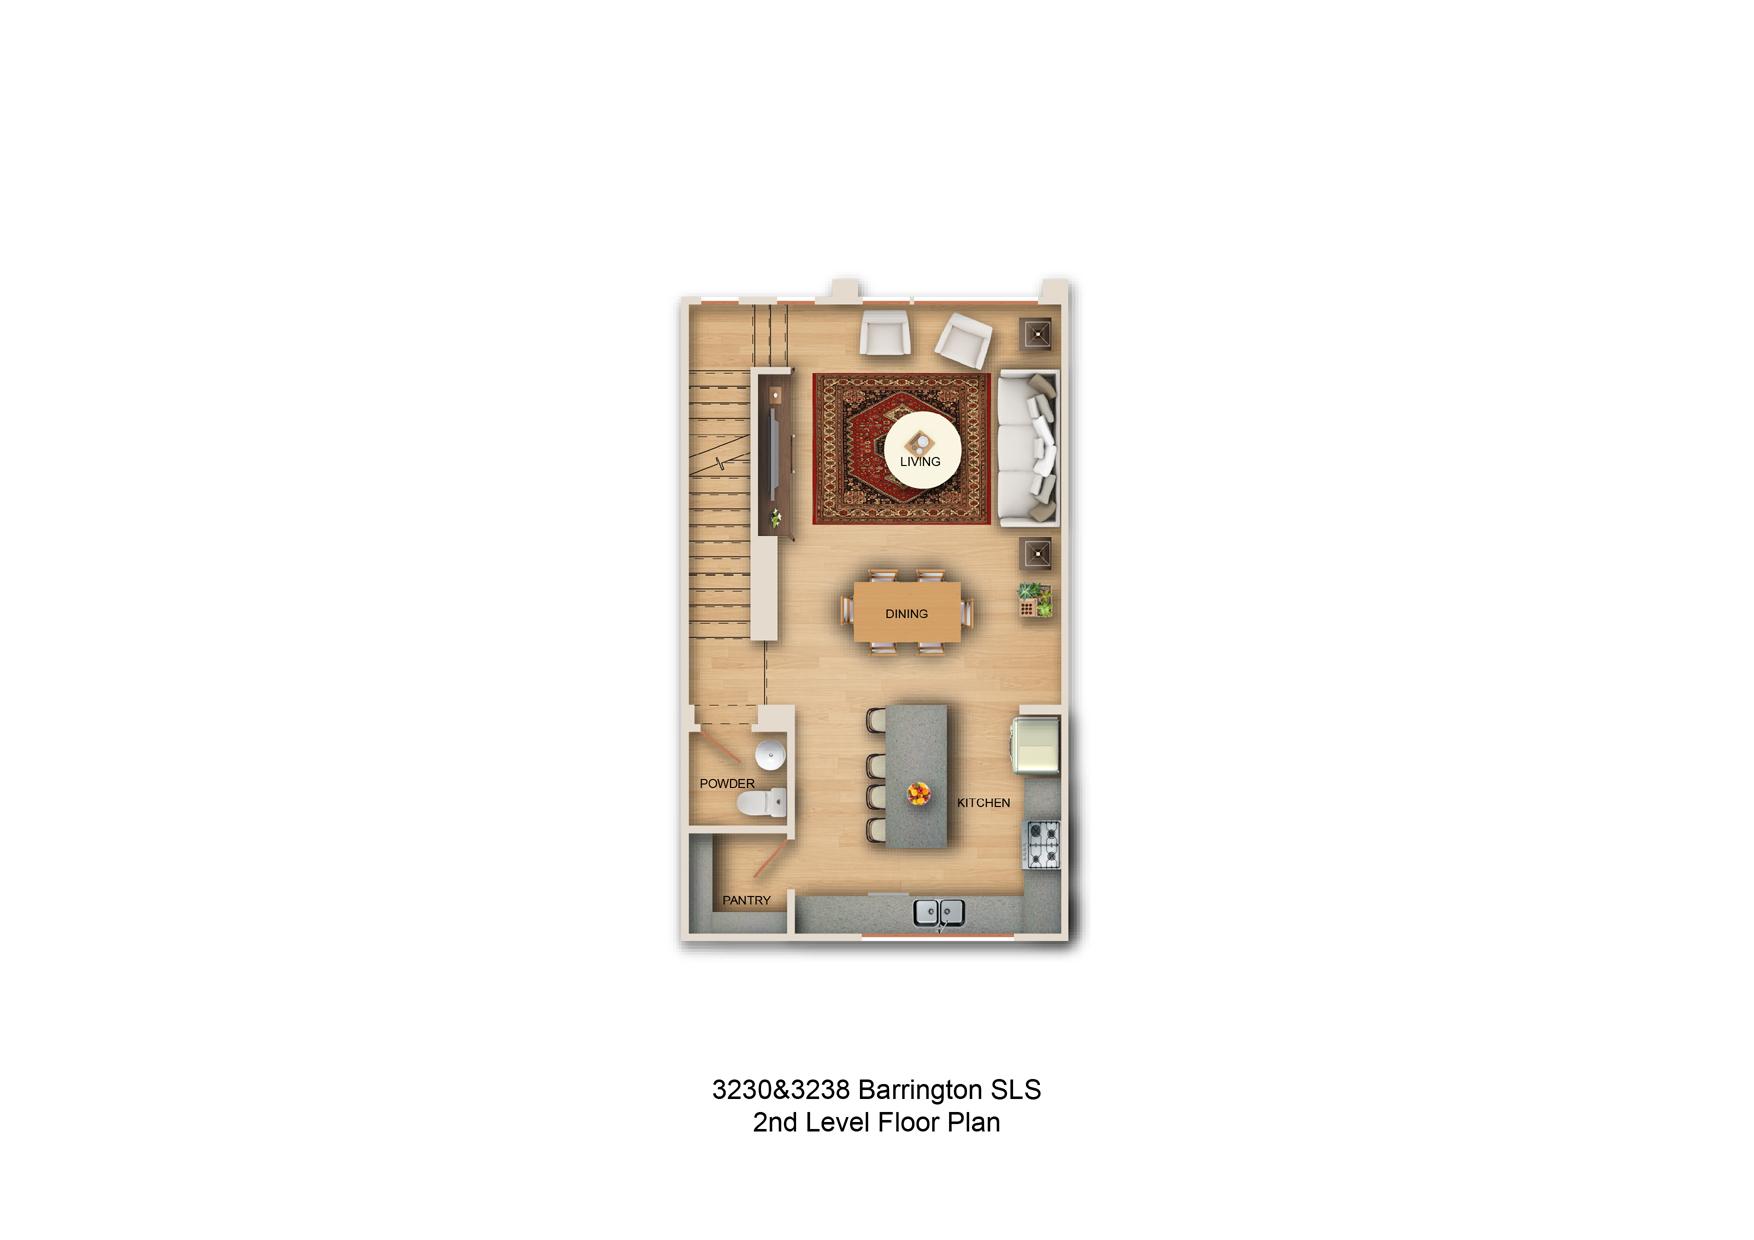 3230_3238-Barrington-SLS-2nd-Level-Floor-Plan-Web.jpg